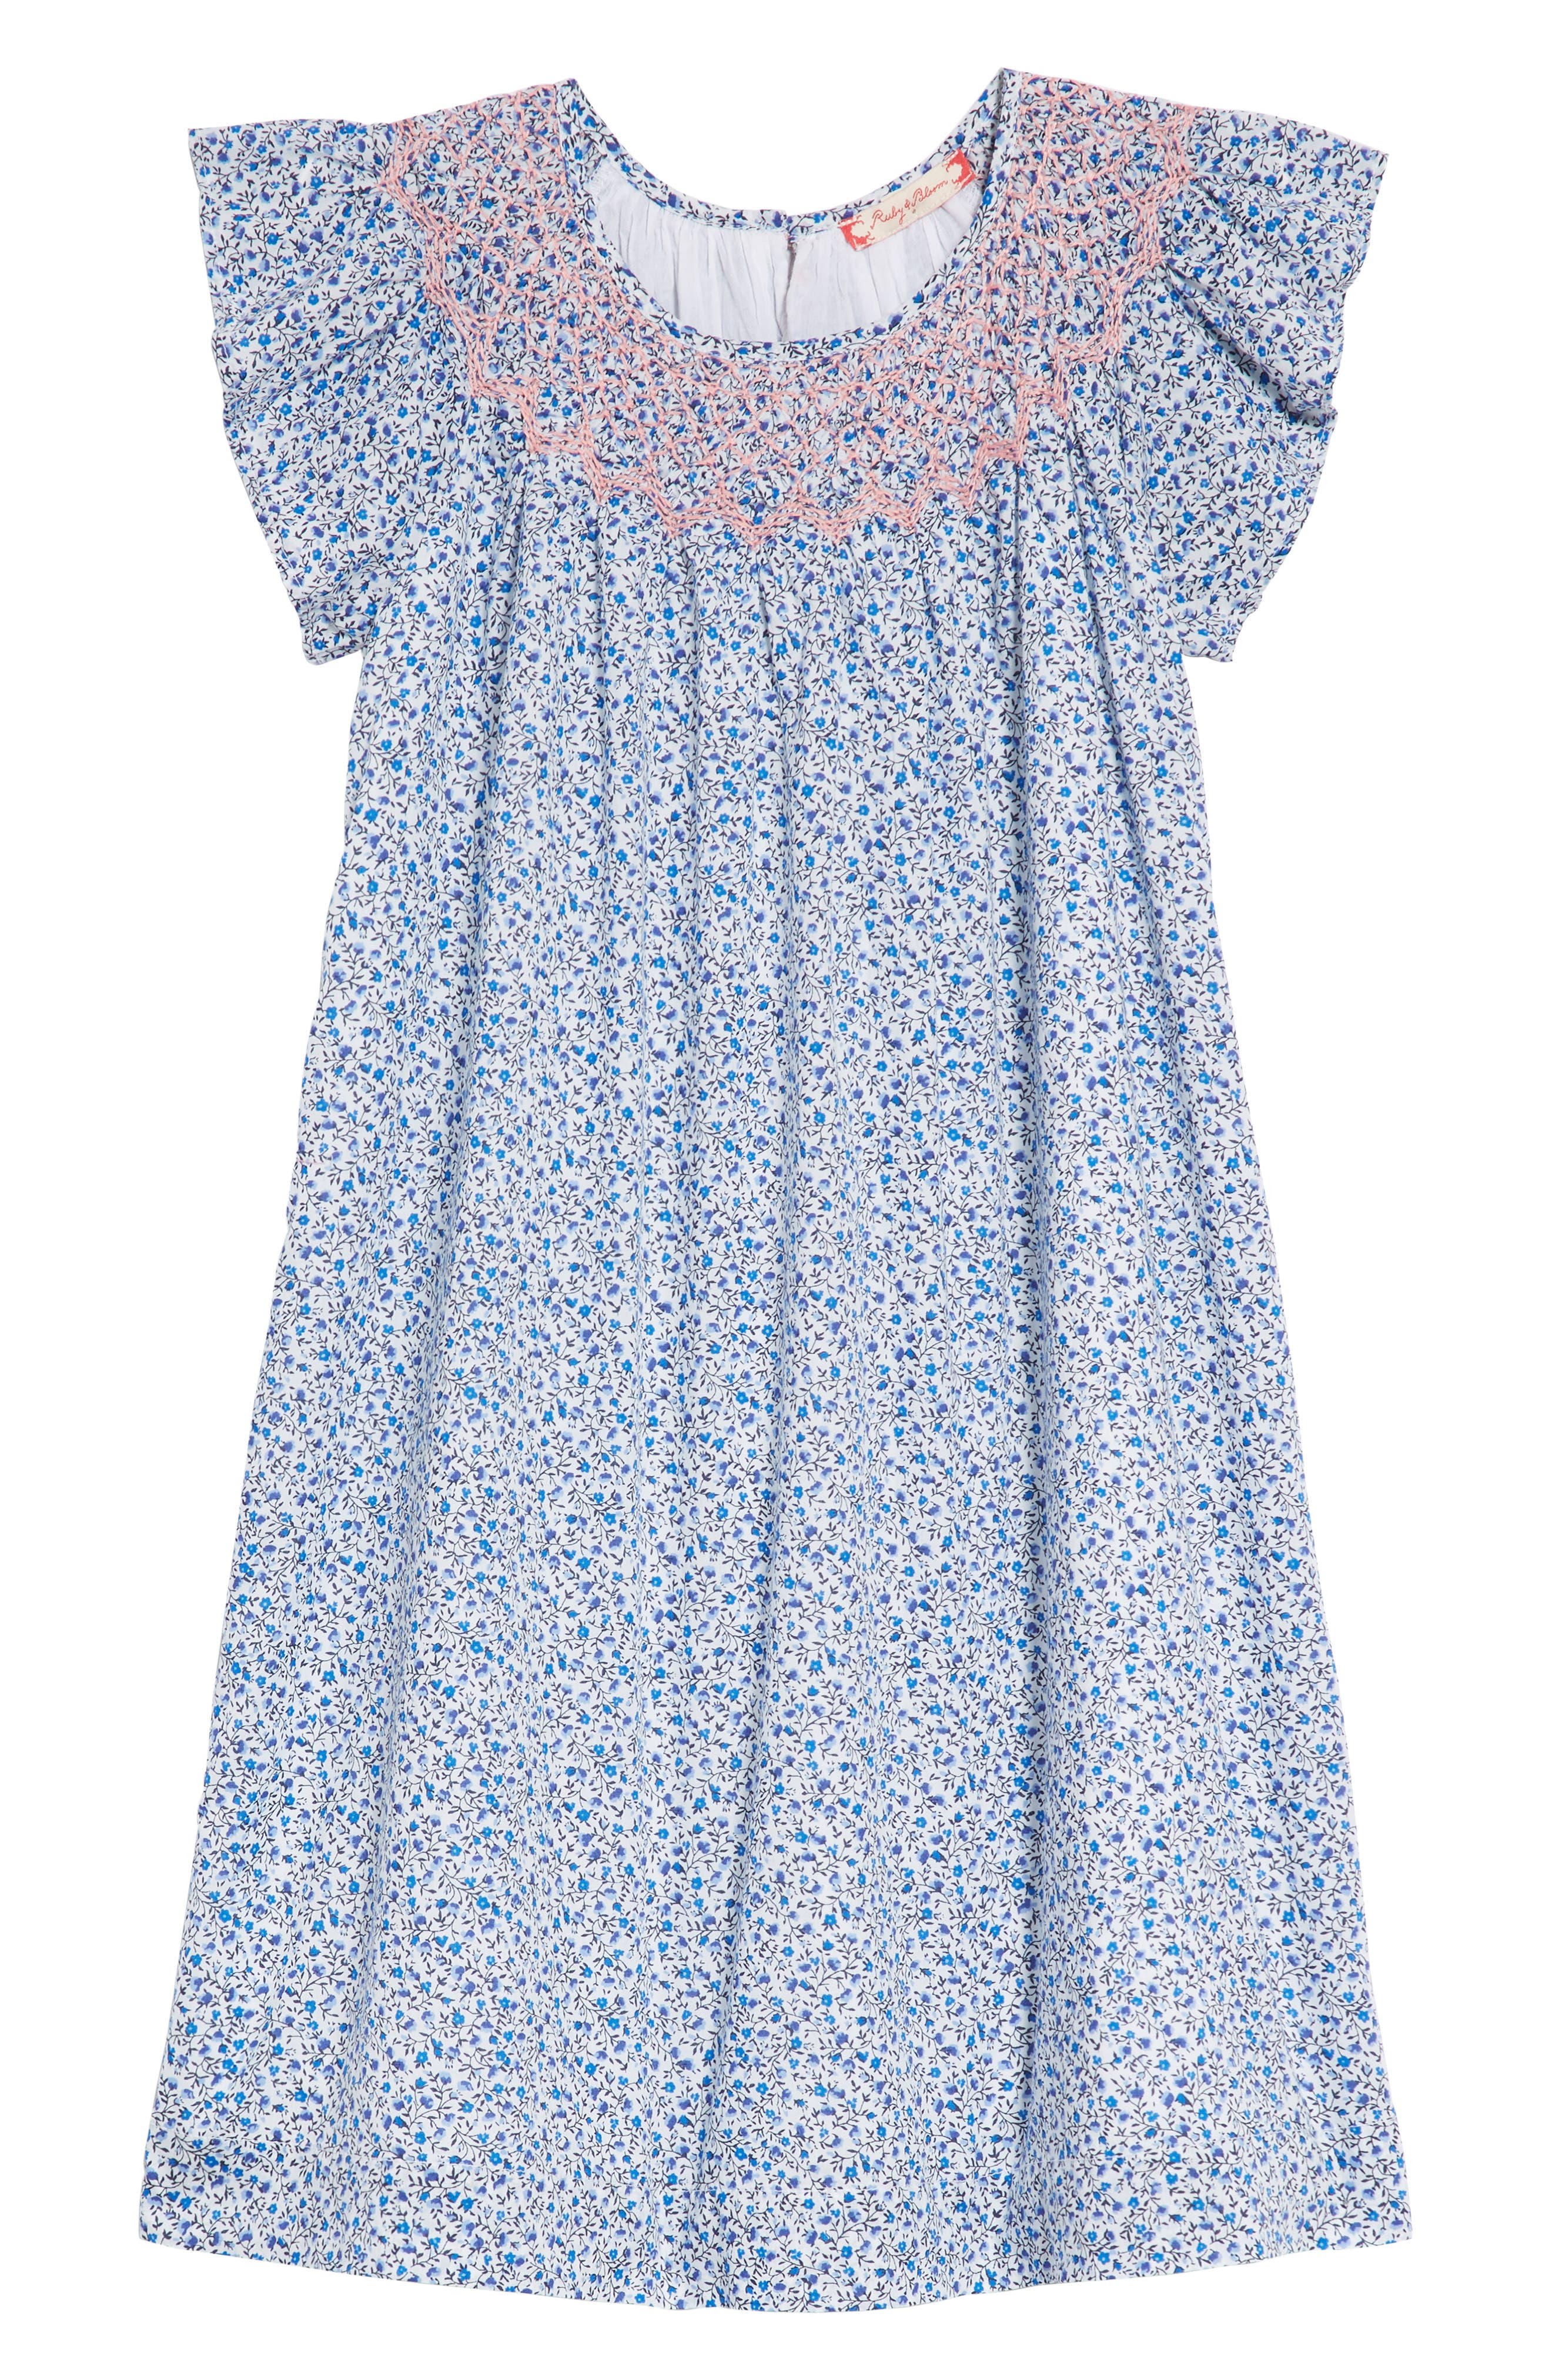 Smocked Ditzy Dress,                             Main thumbnail 1, color,                             White- Blue Ditsy